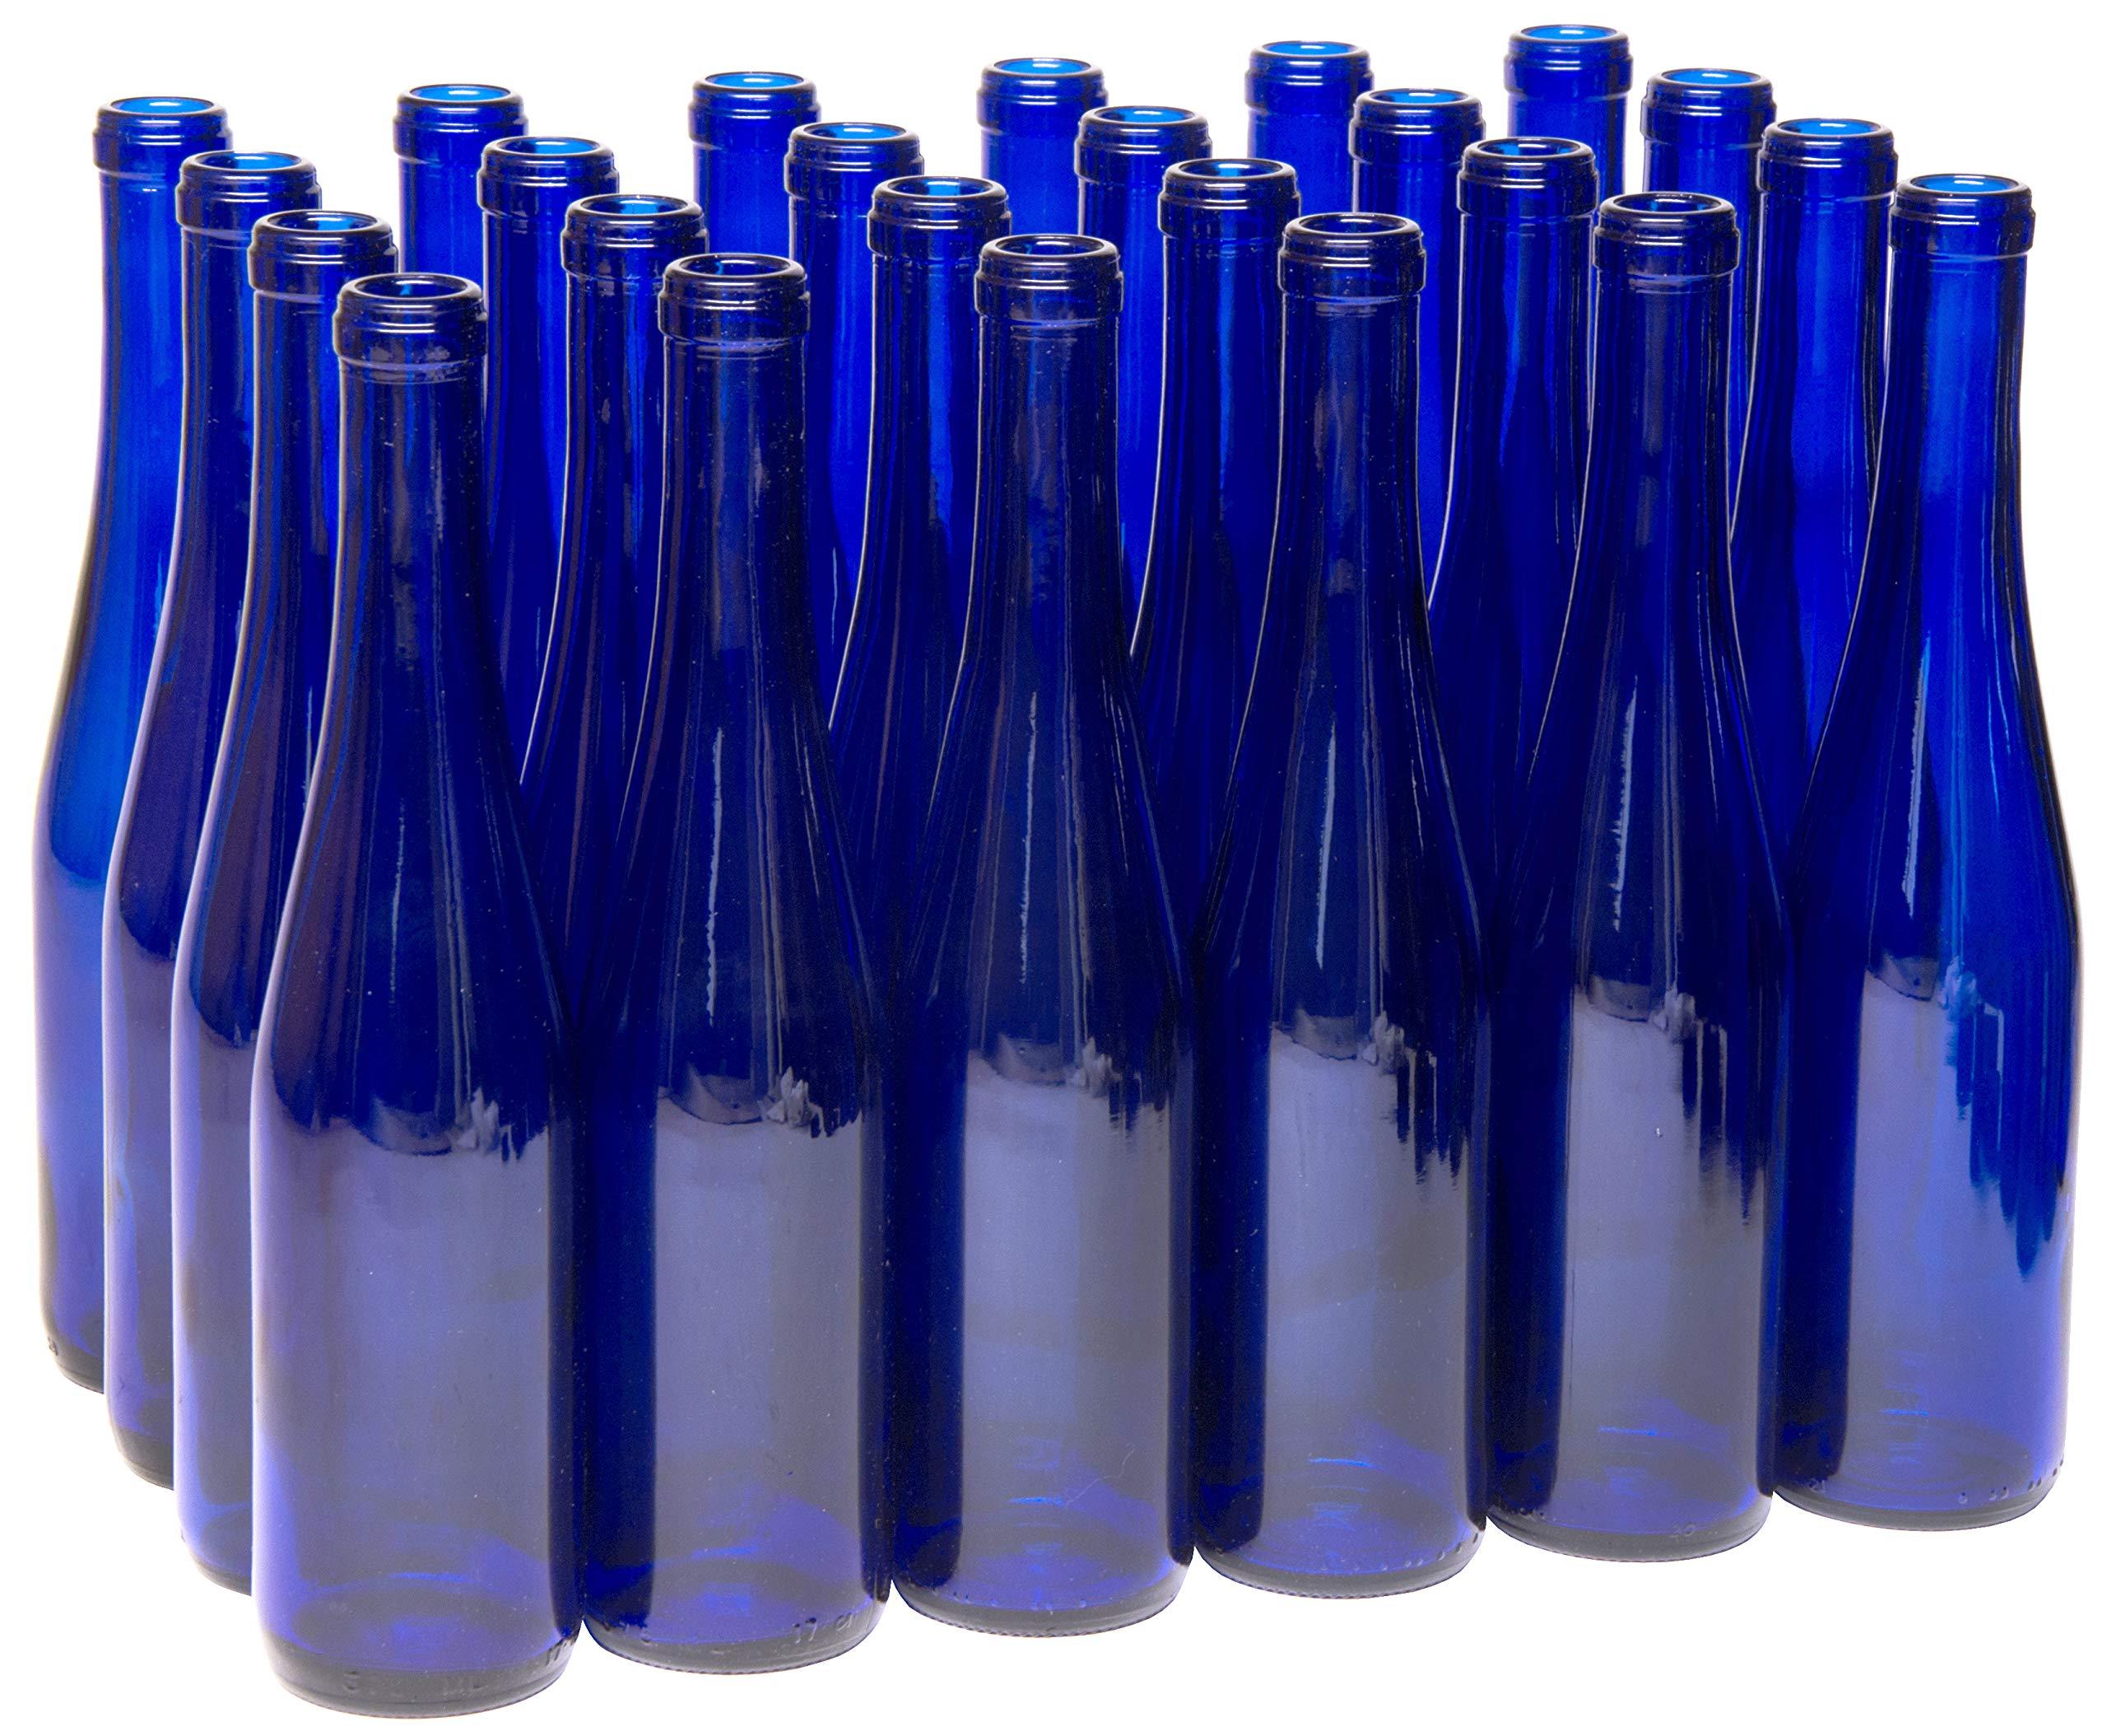 North Mountain Supply 375ml Cobalt Blue Glass Stretch Hock Wine Bottle Flat-Bottomed Cork Finish - Case of 24 by North Mountain Supply (Image #1)